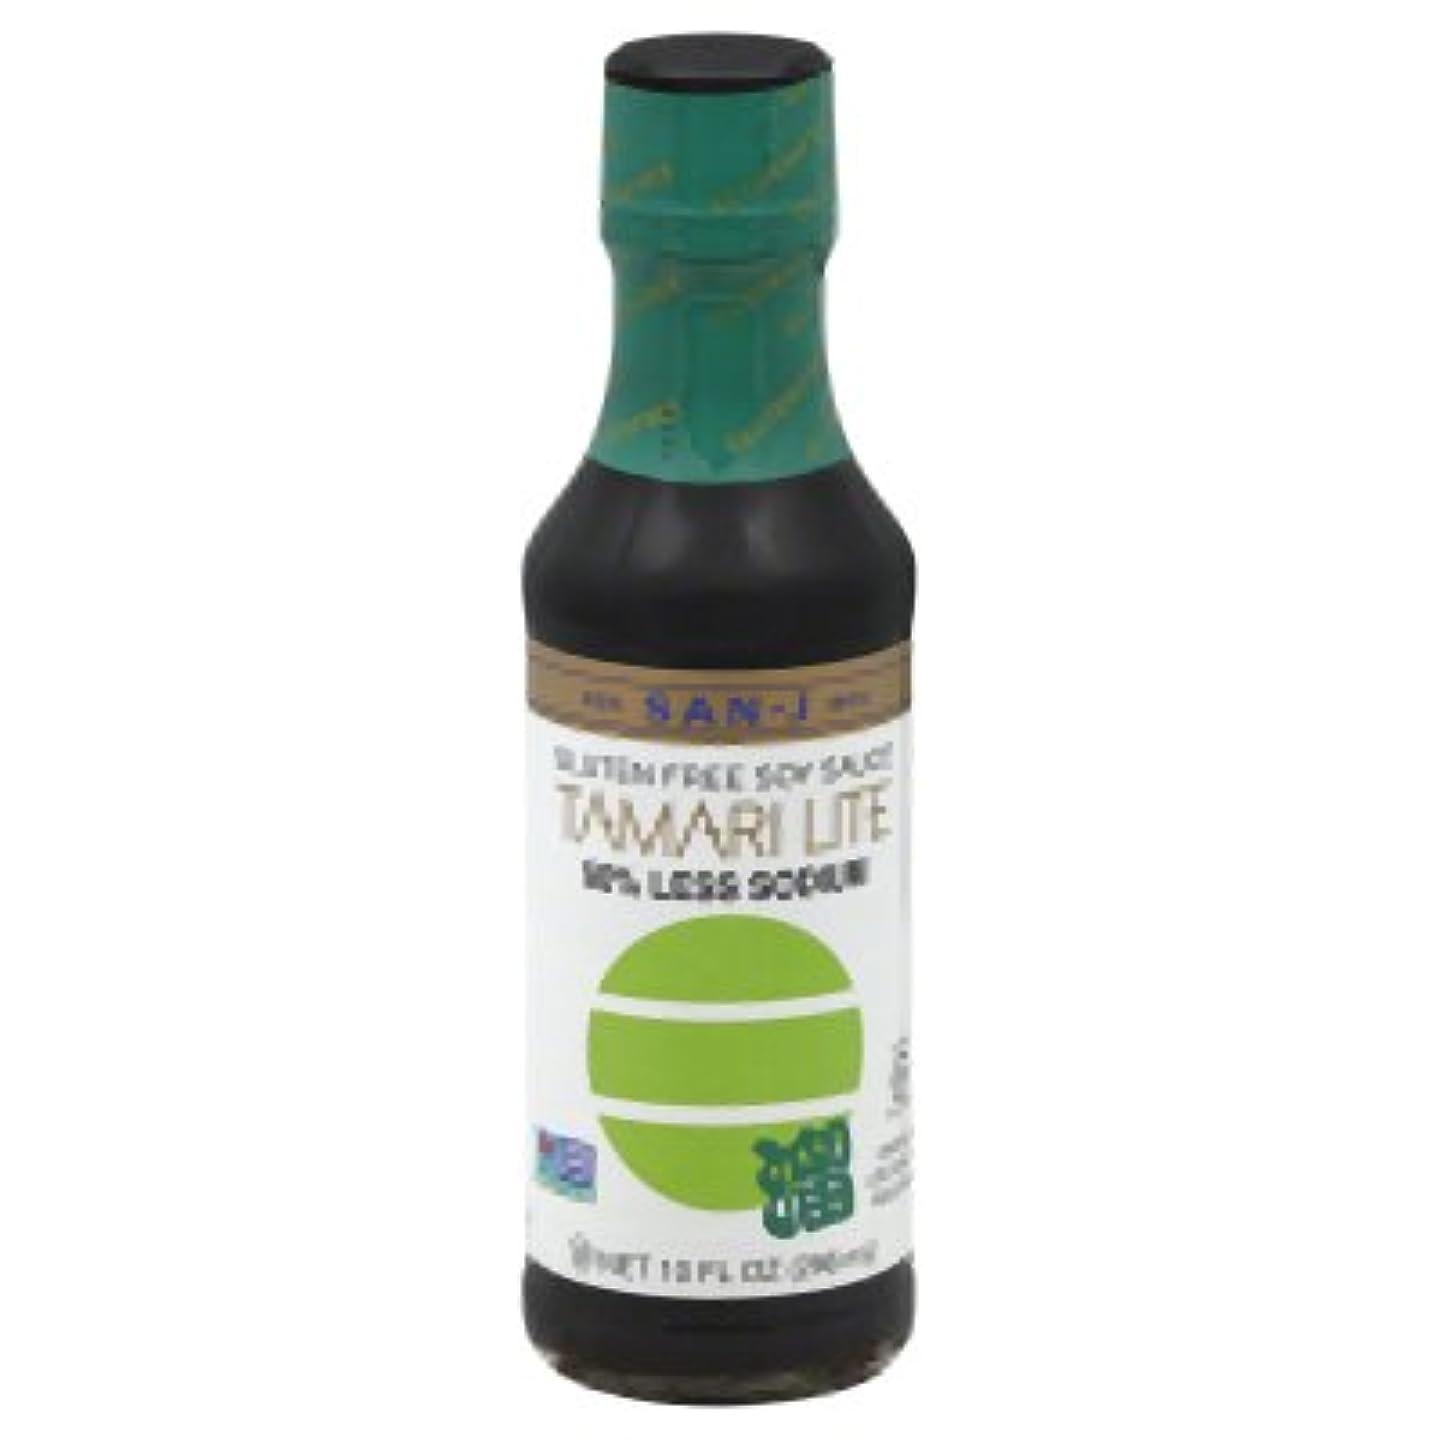 San J Gluten Free Tamari Lite Soy Sauce, 10 Fluid Ounce - 6 per case. fjonsqbfmya8